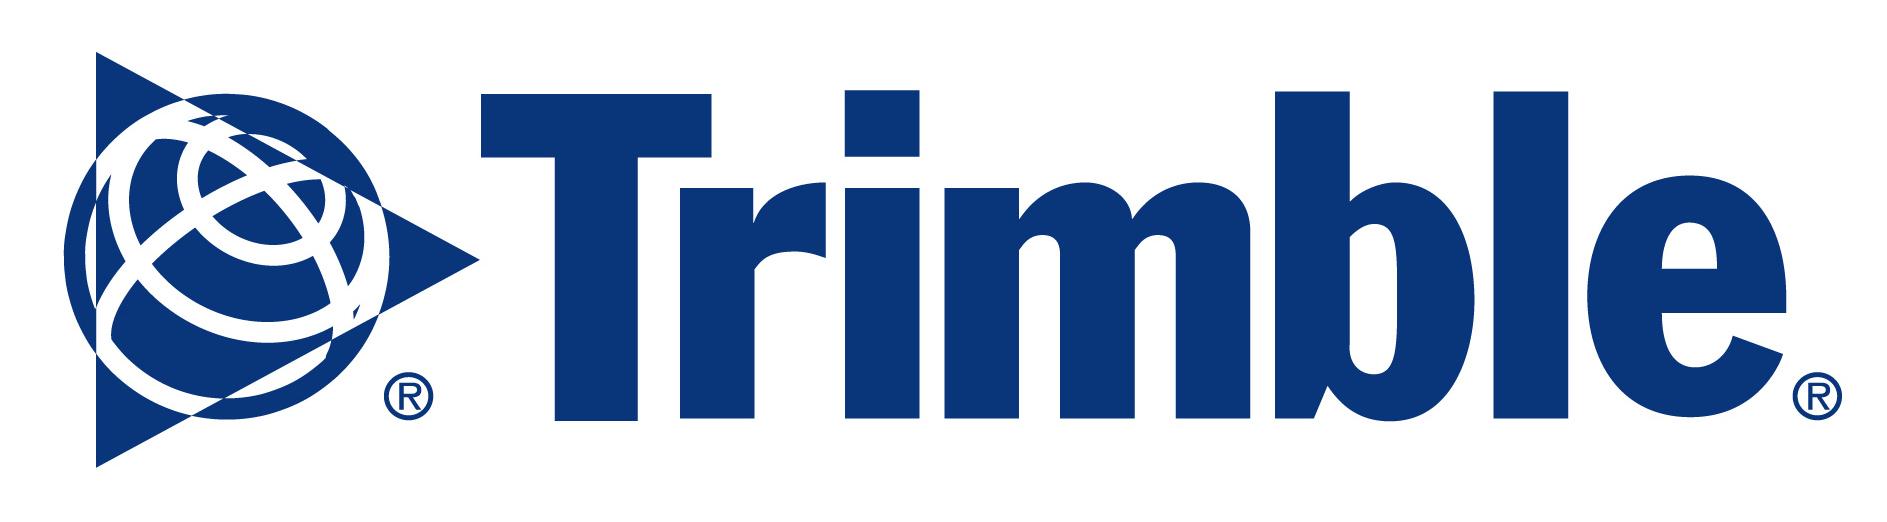 Trimble Navigation Limited (NASDAQ:TRMB)